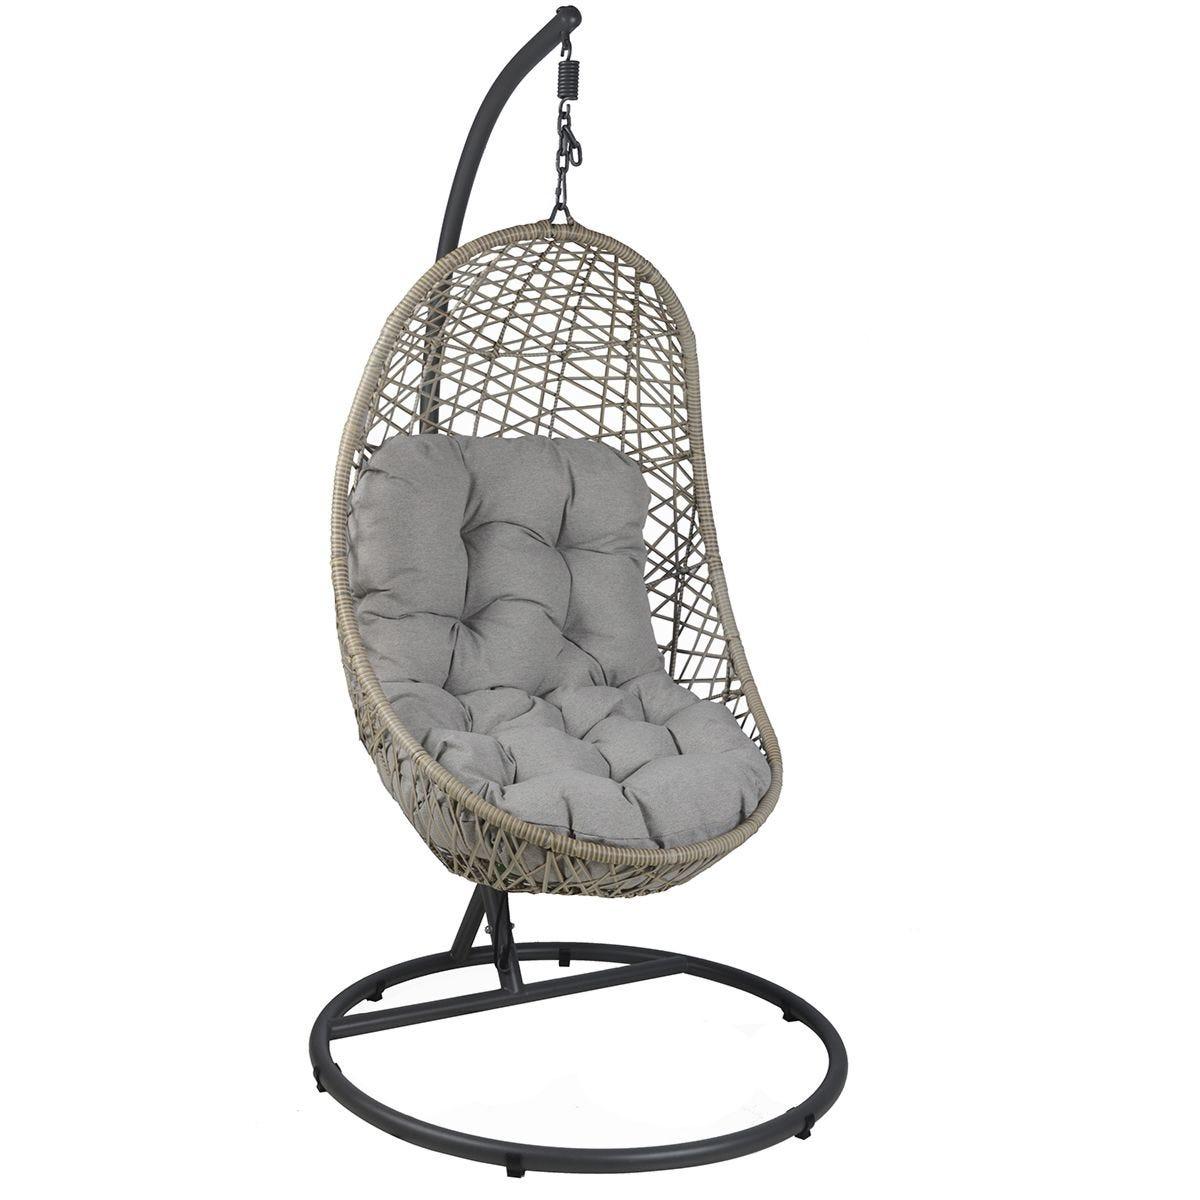 LG Outdoor Monaco Hazel Egg Chair